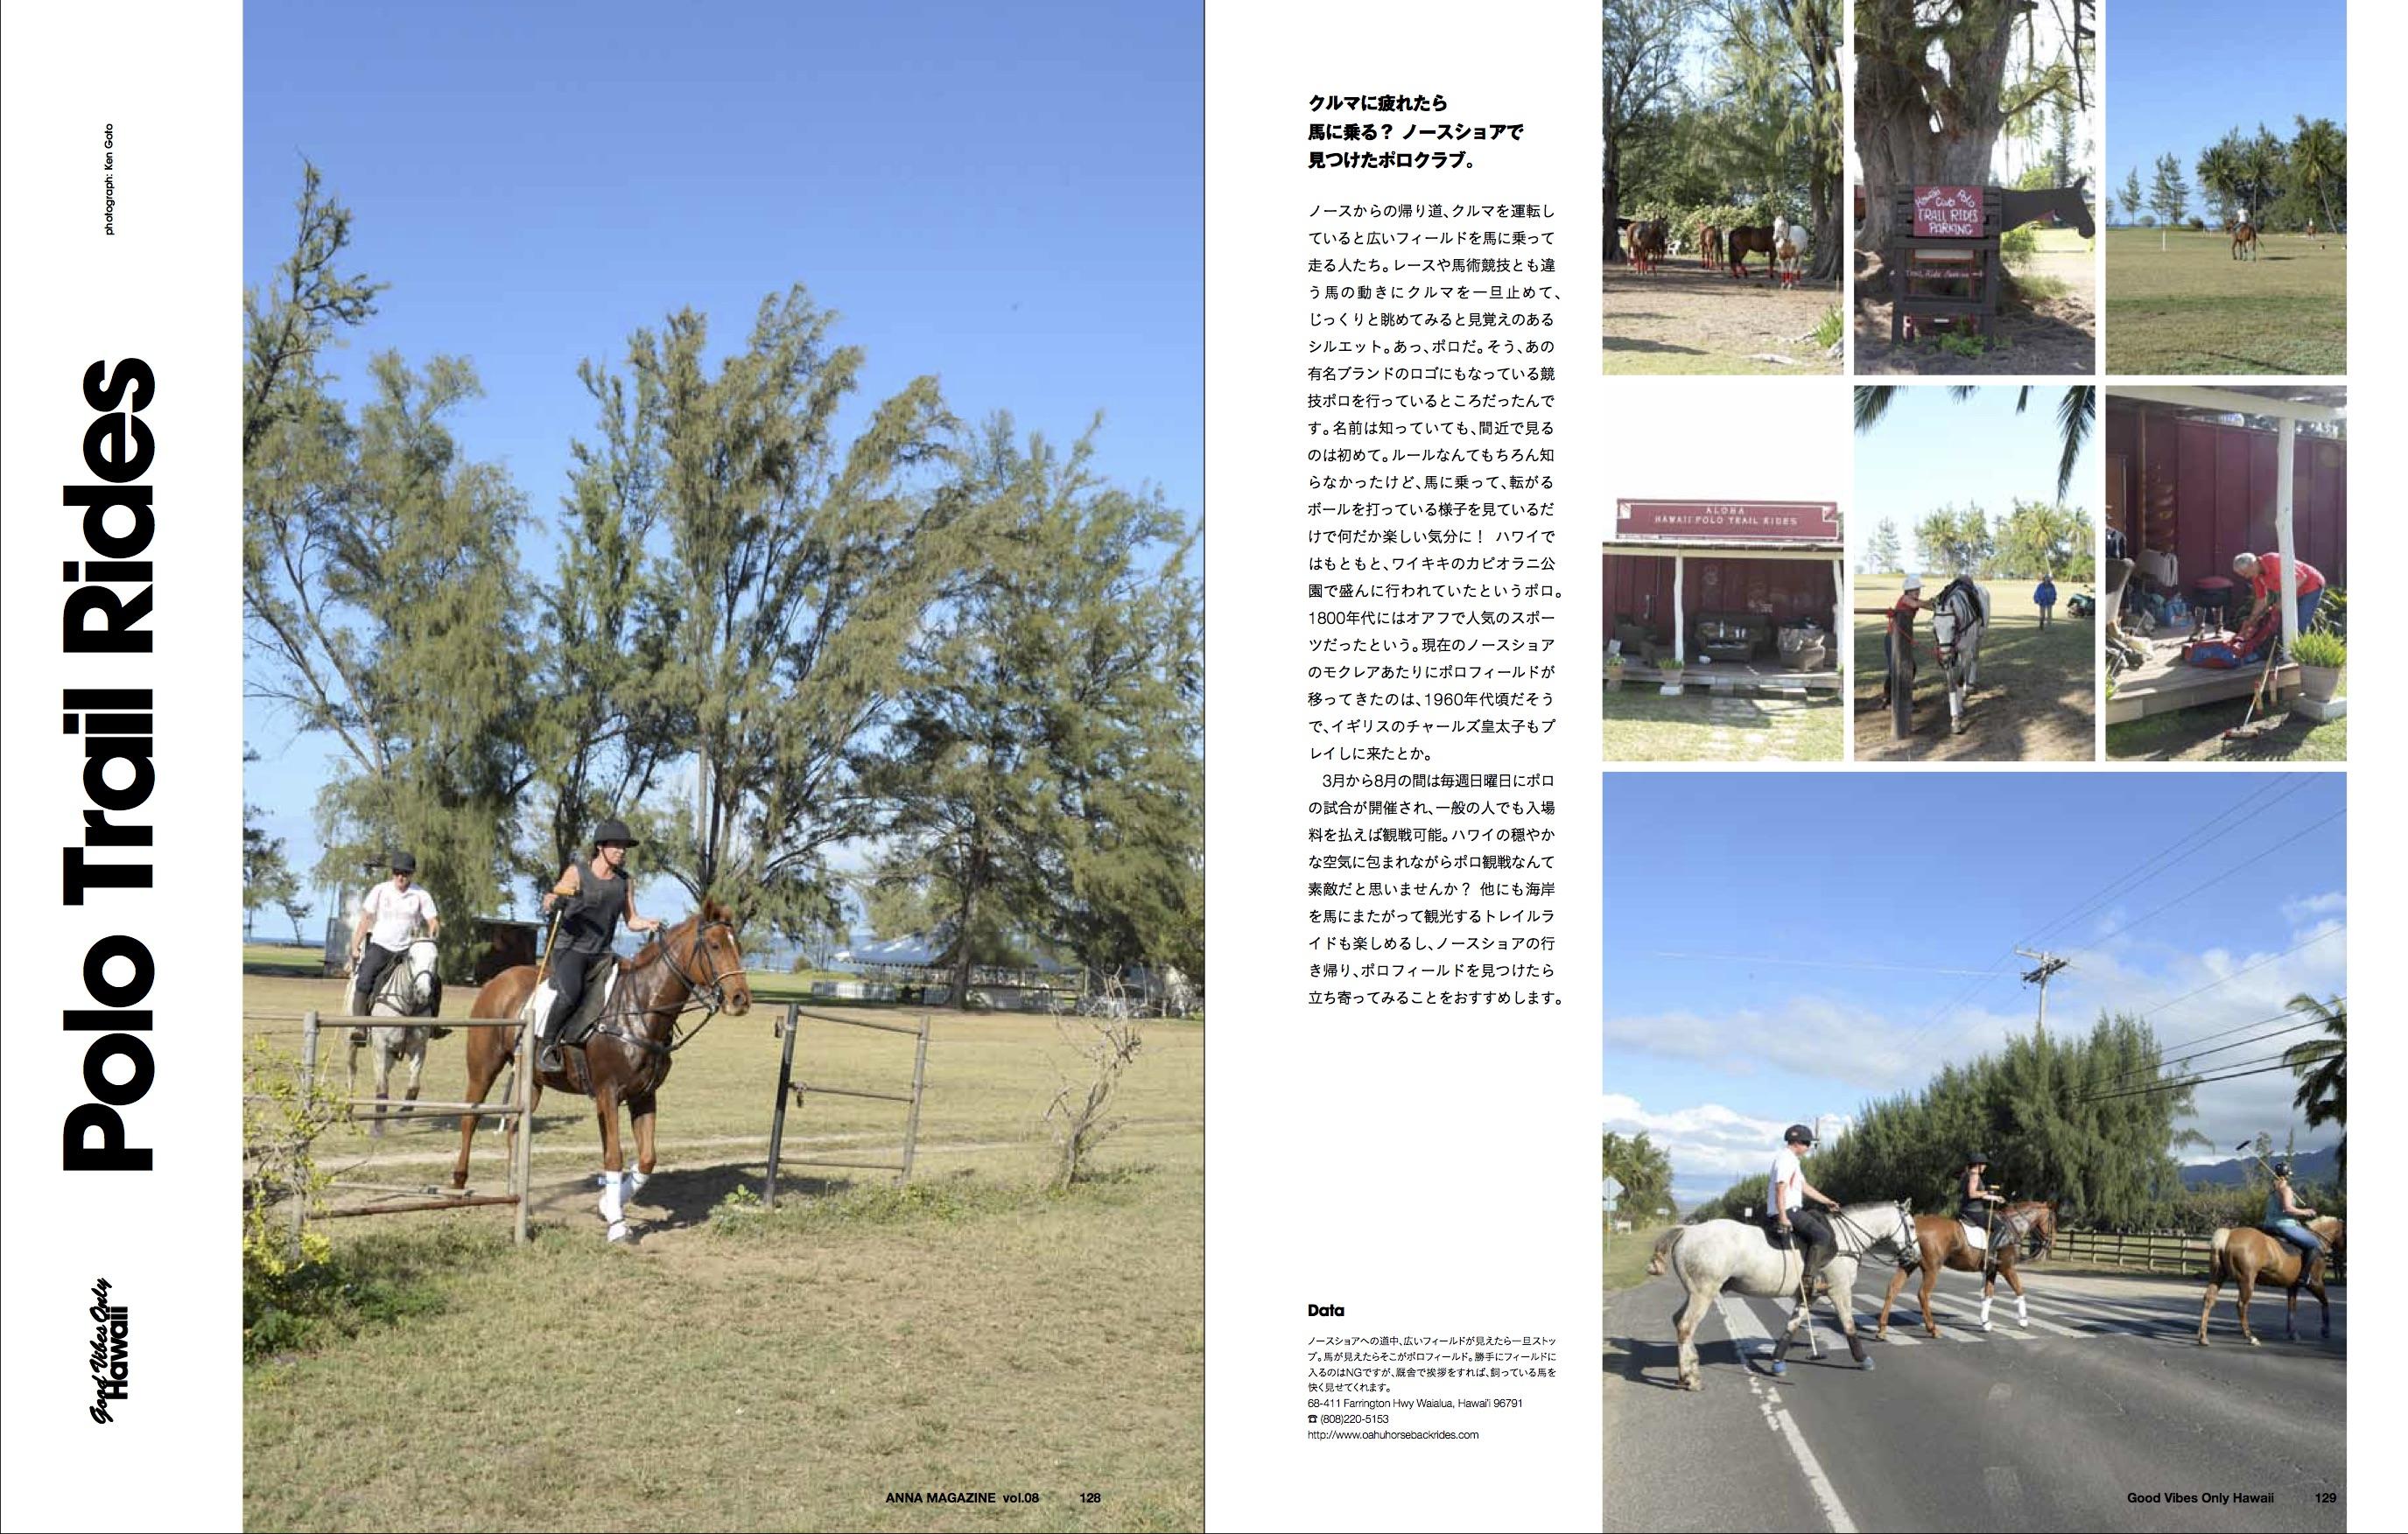 anna magazine vol.8 P62